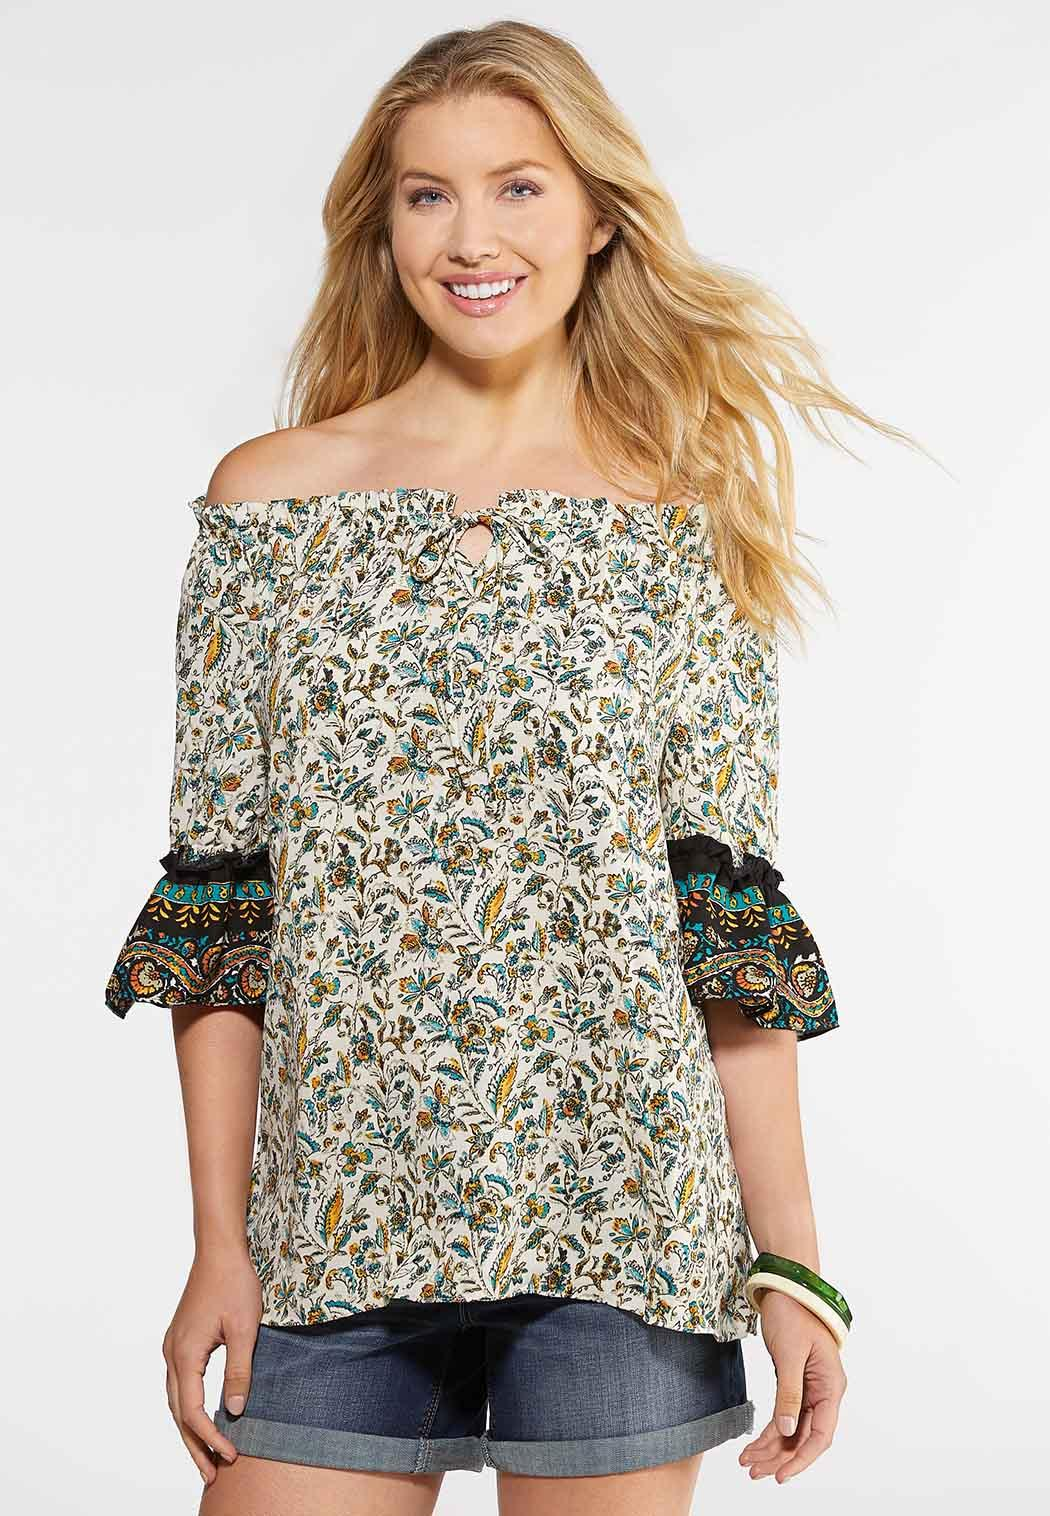 Plus Size Bohemian Poet Top Shirts & Amp ; Blouses Cato Fashions